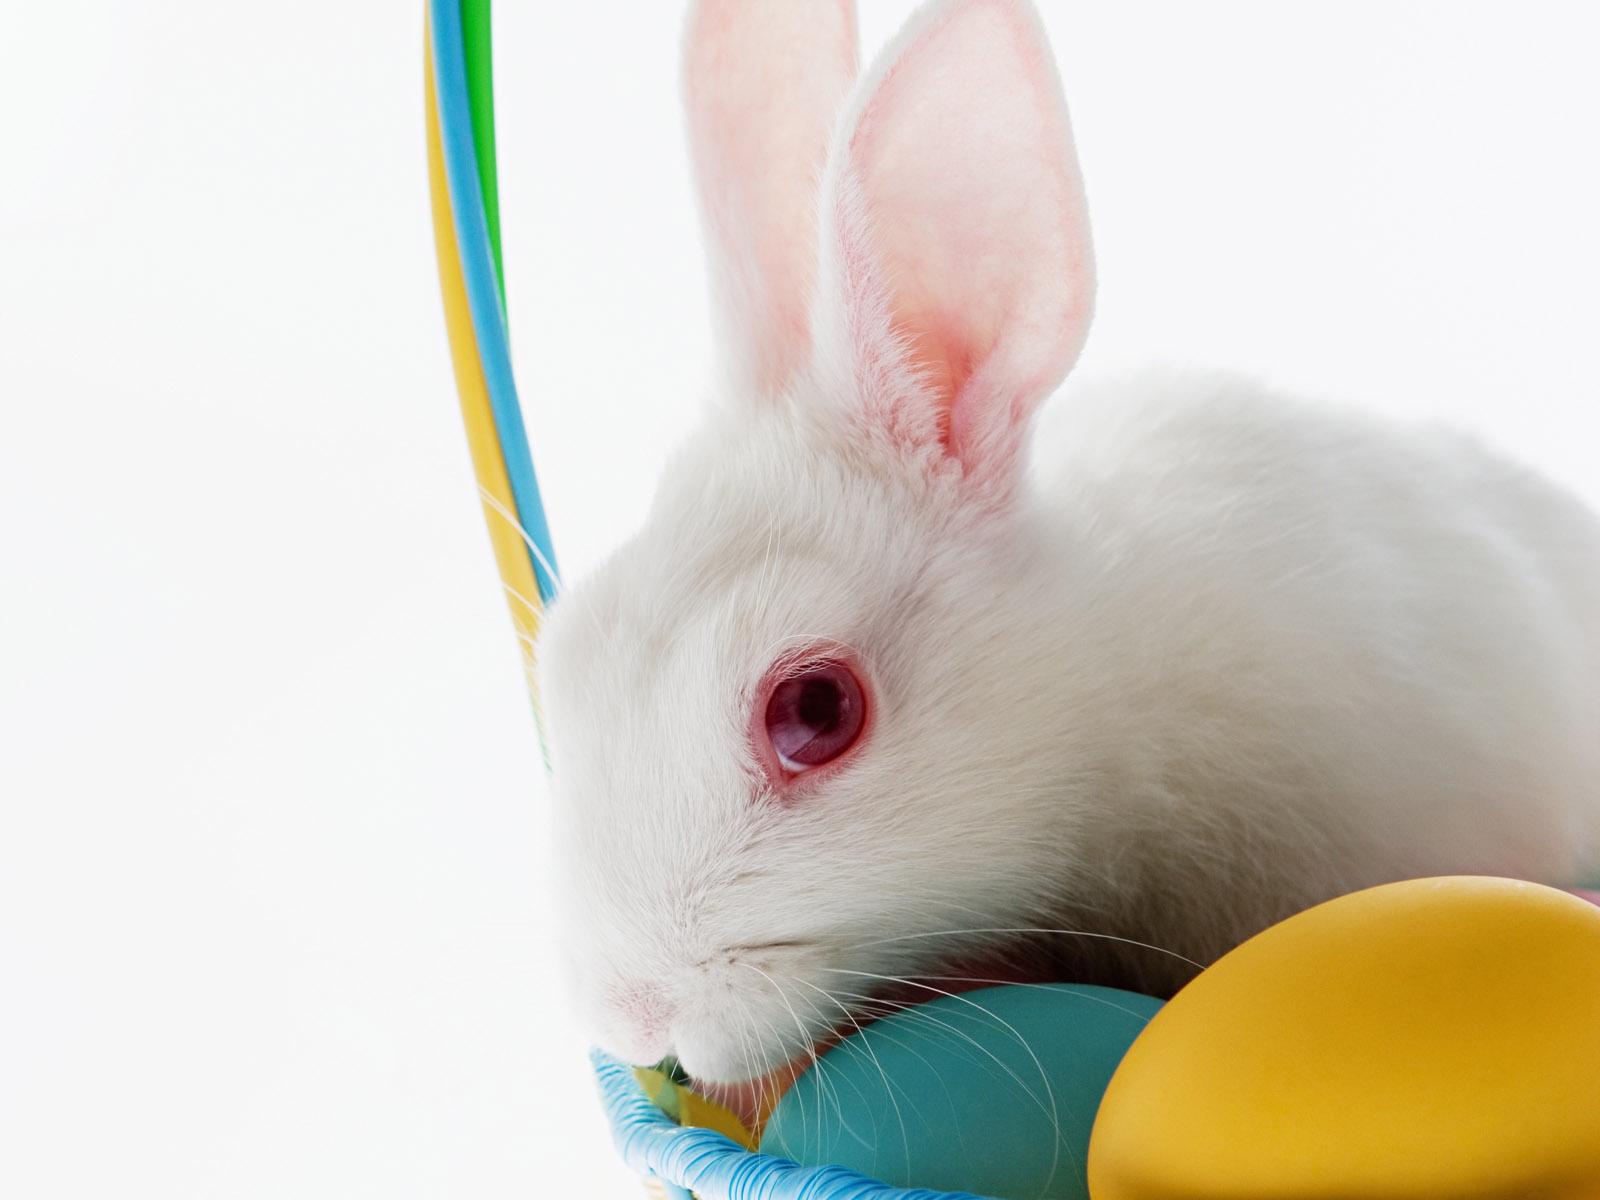 Bunny Rabbit Easter Wallpapers for Desktop Christian Wallpapers 1600x1200